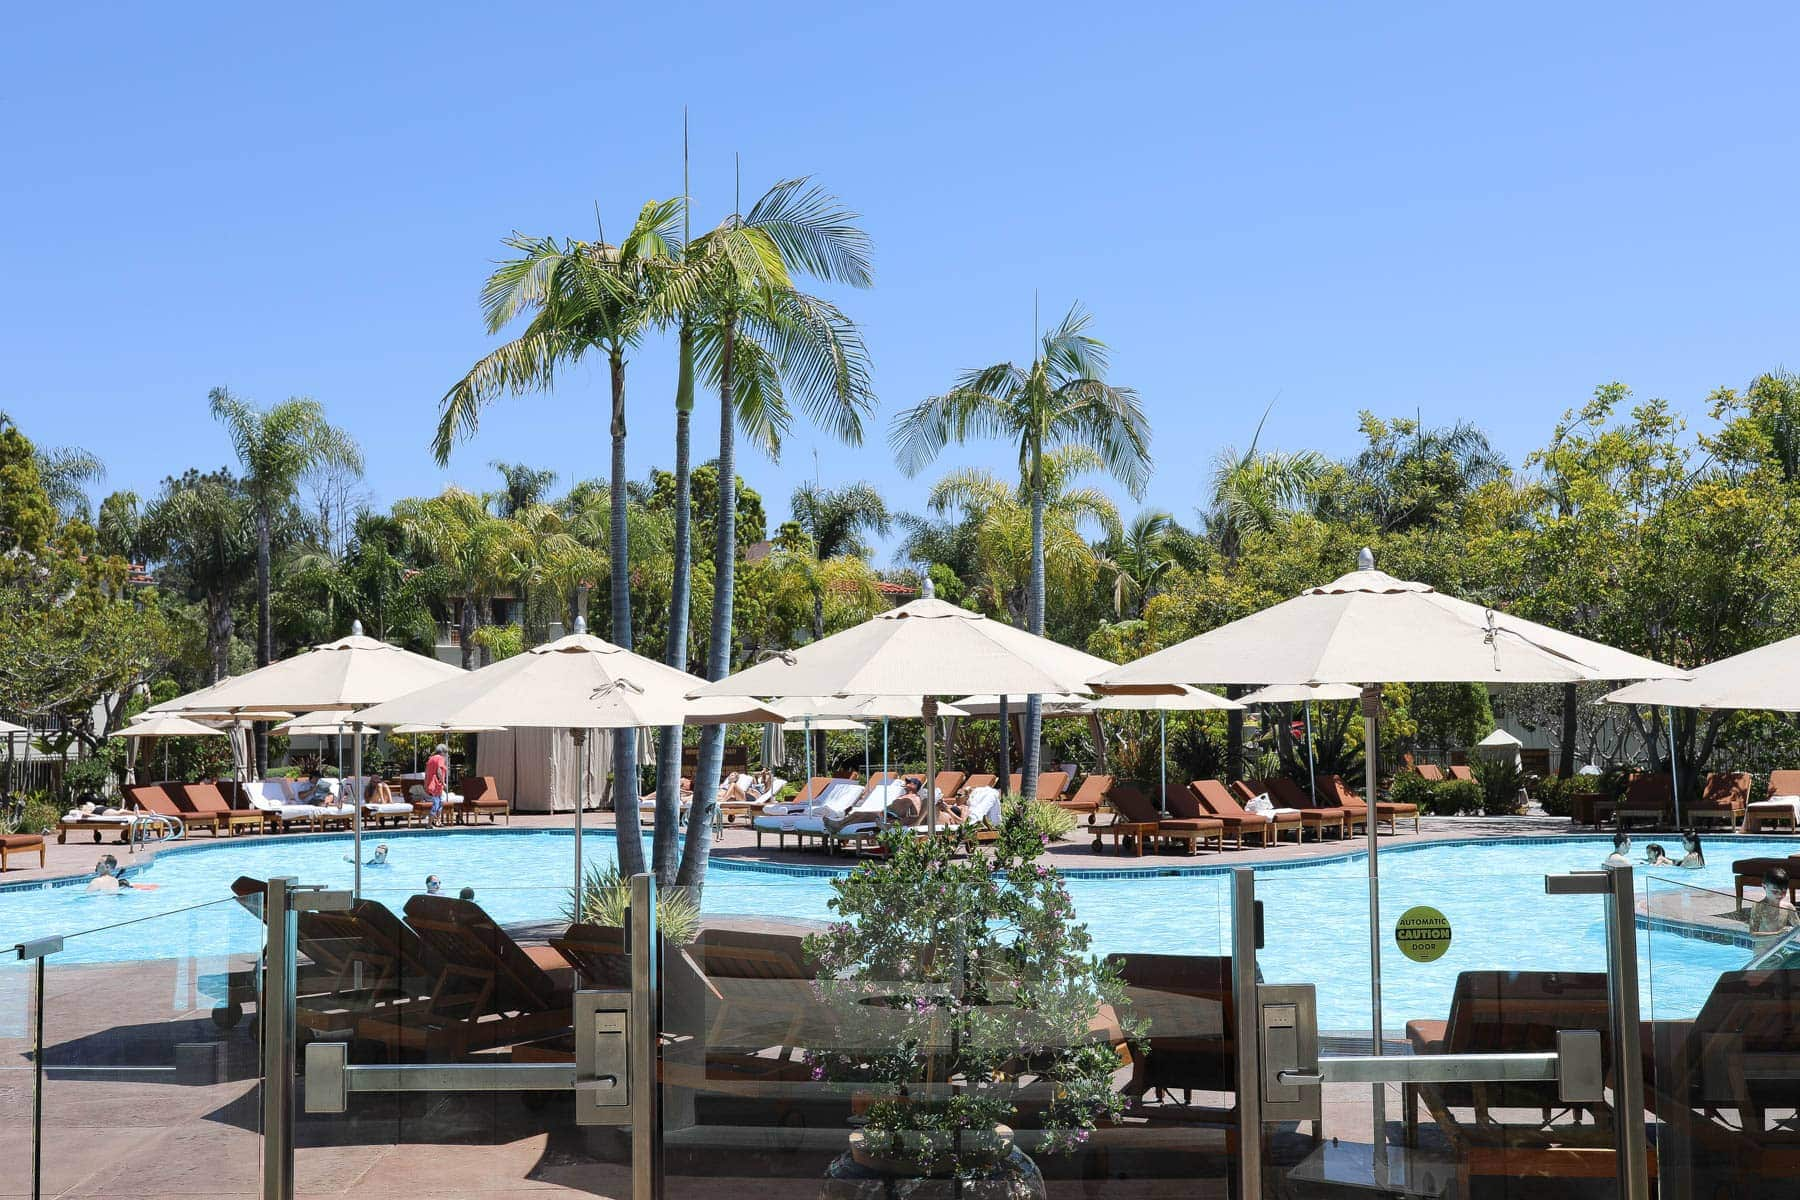 Hotel Ameneties #familytravelsandiego #sandiego #fourseasonsresidenceclub #bigfamilytravel